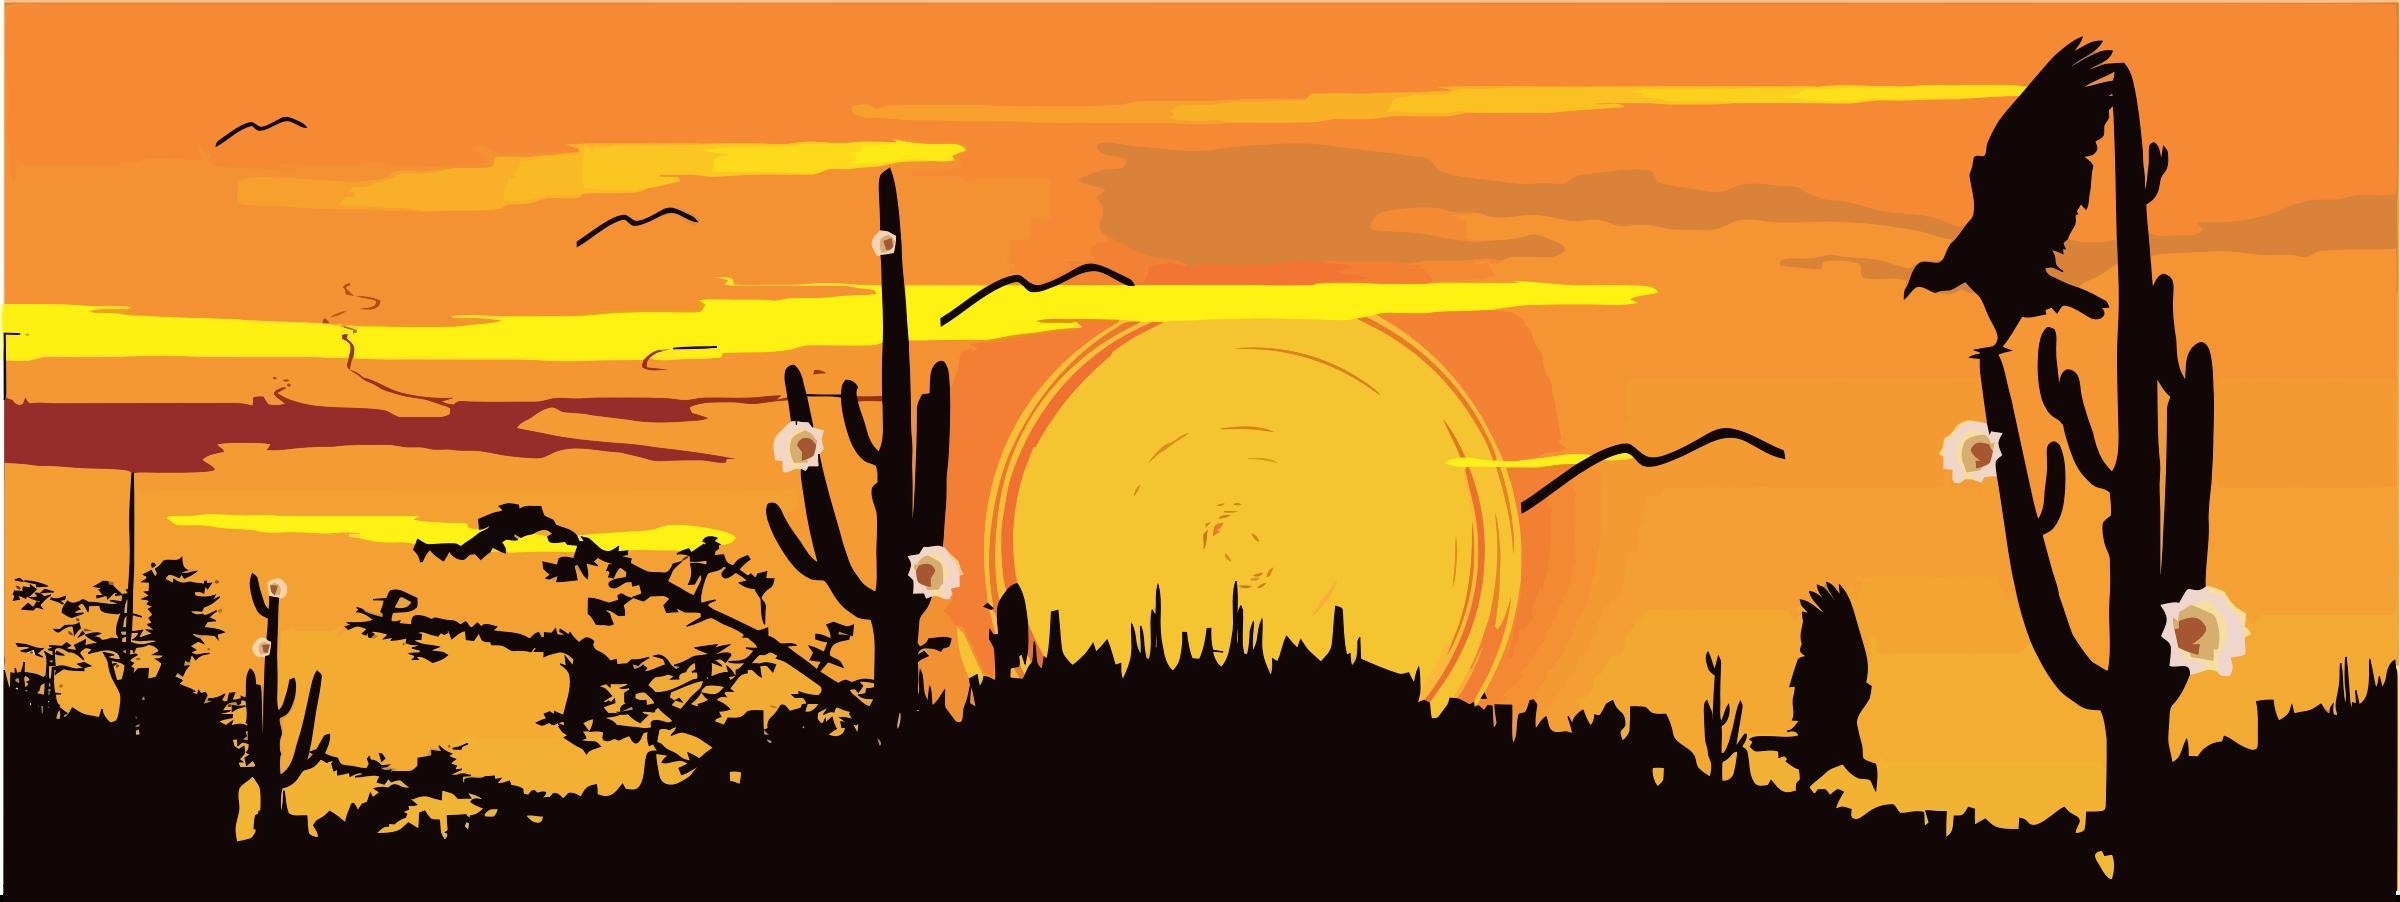 In The Desert clipart silhouette Silhouette Desert Clipart Desert Silhouette